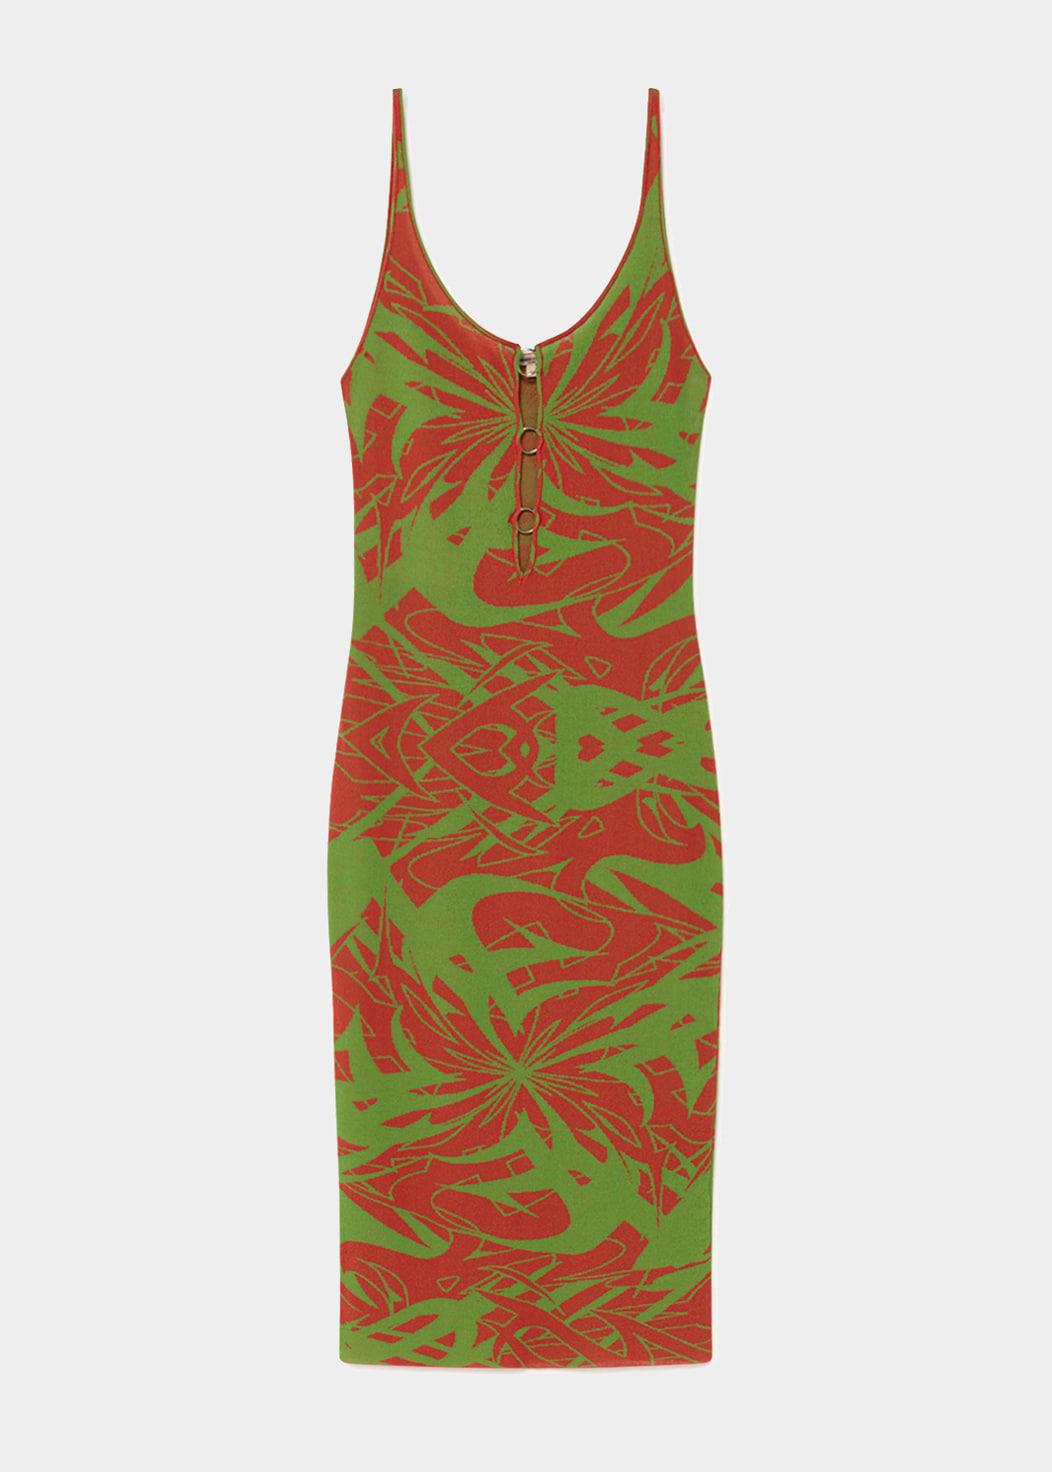 SCORPIA DRESS